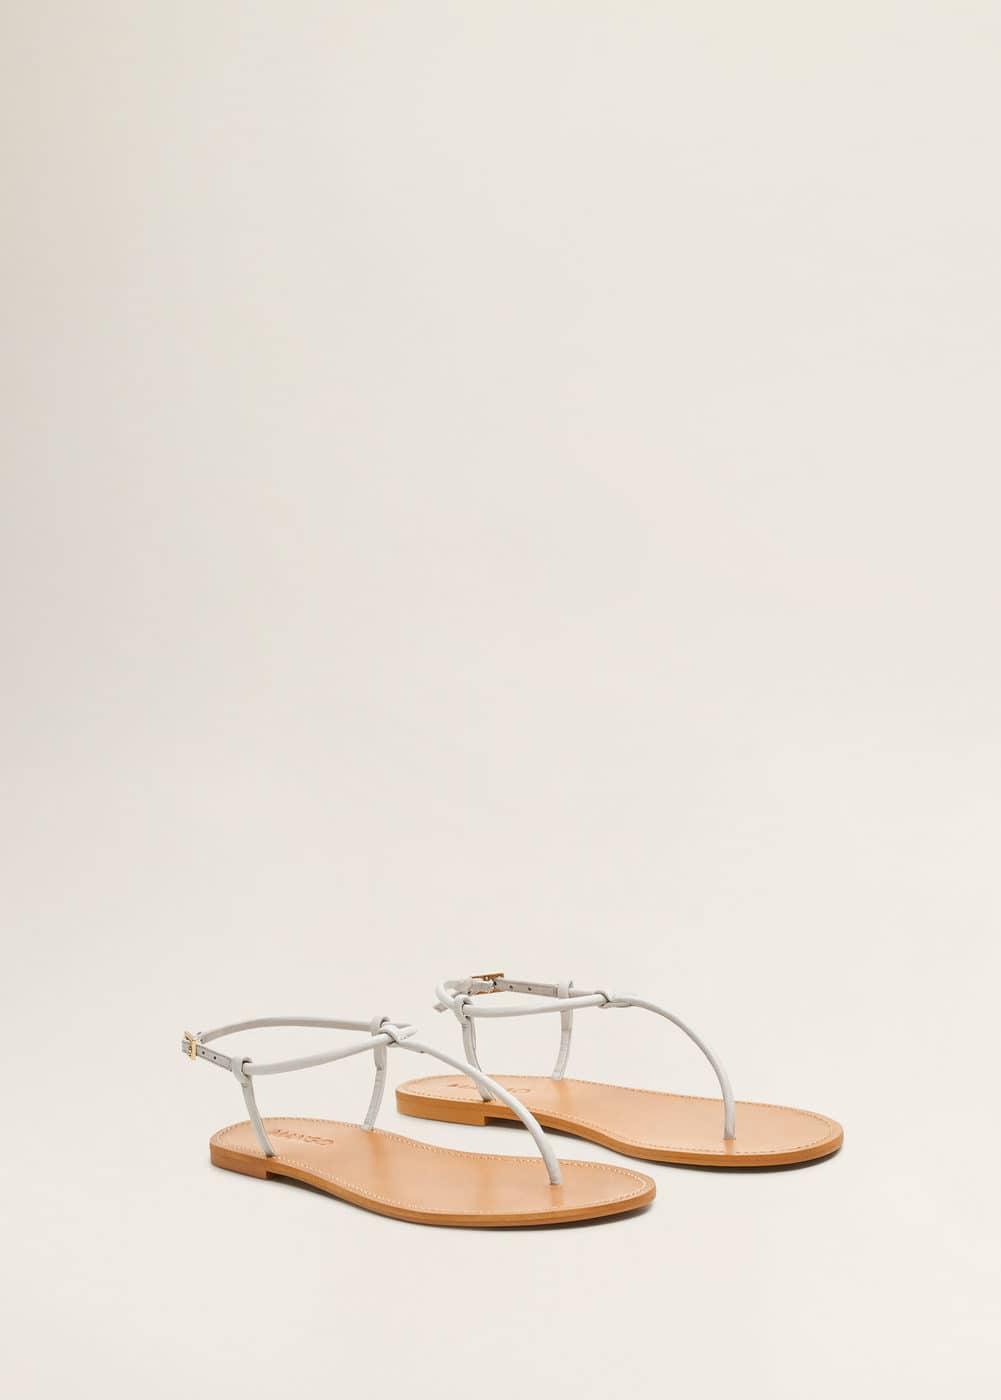 m-formen:sandalia piel tiras